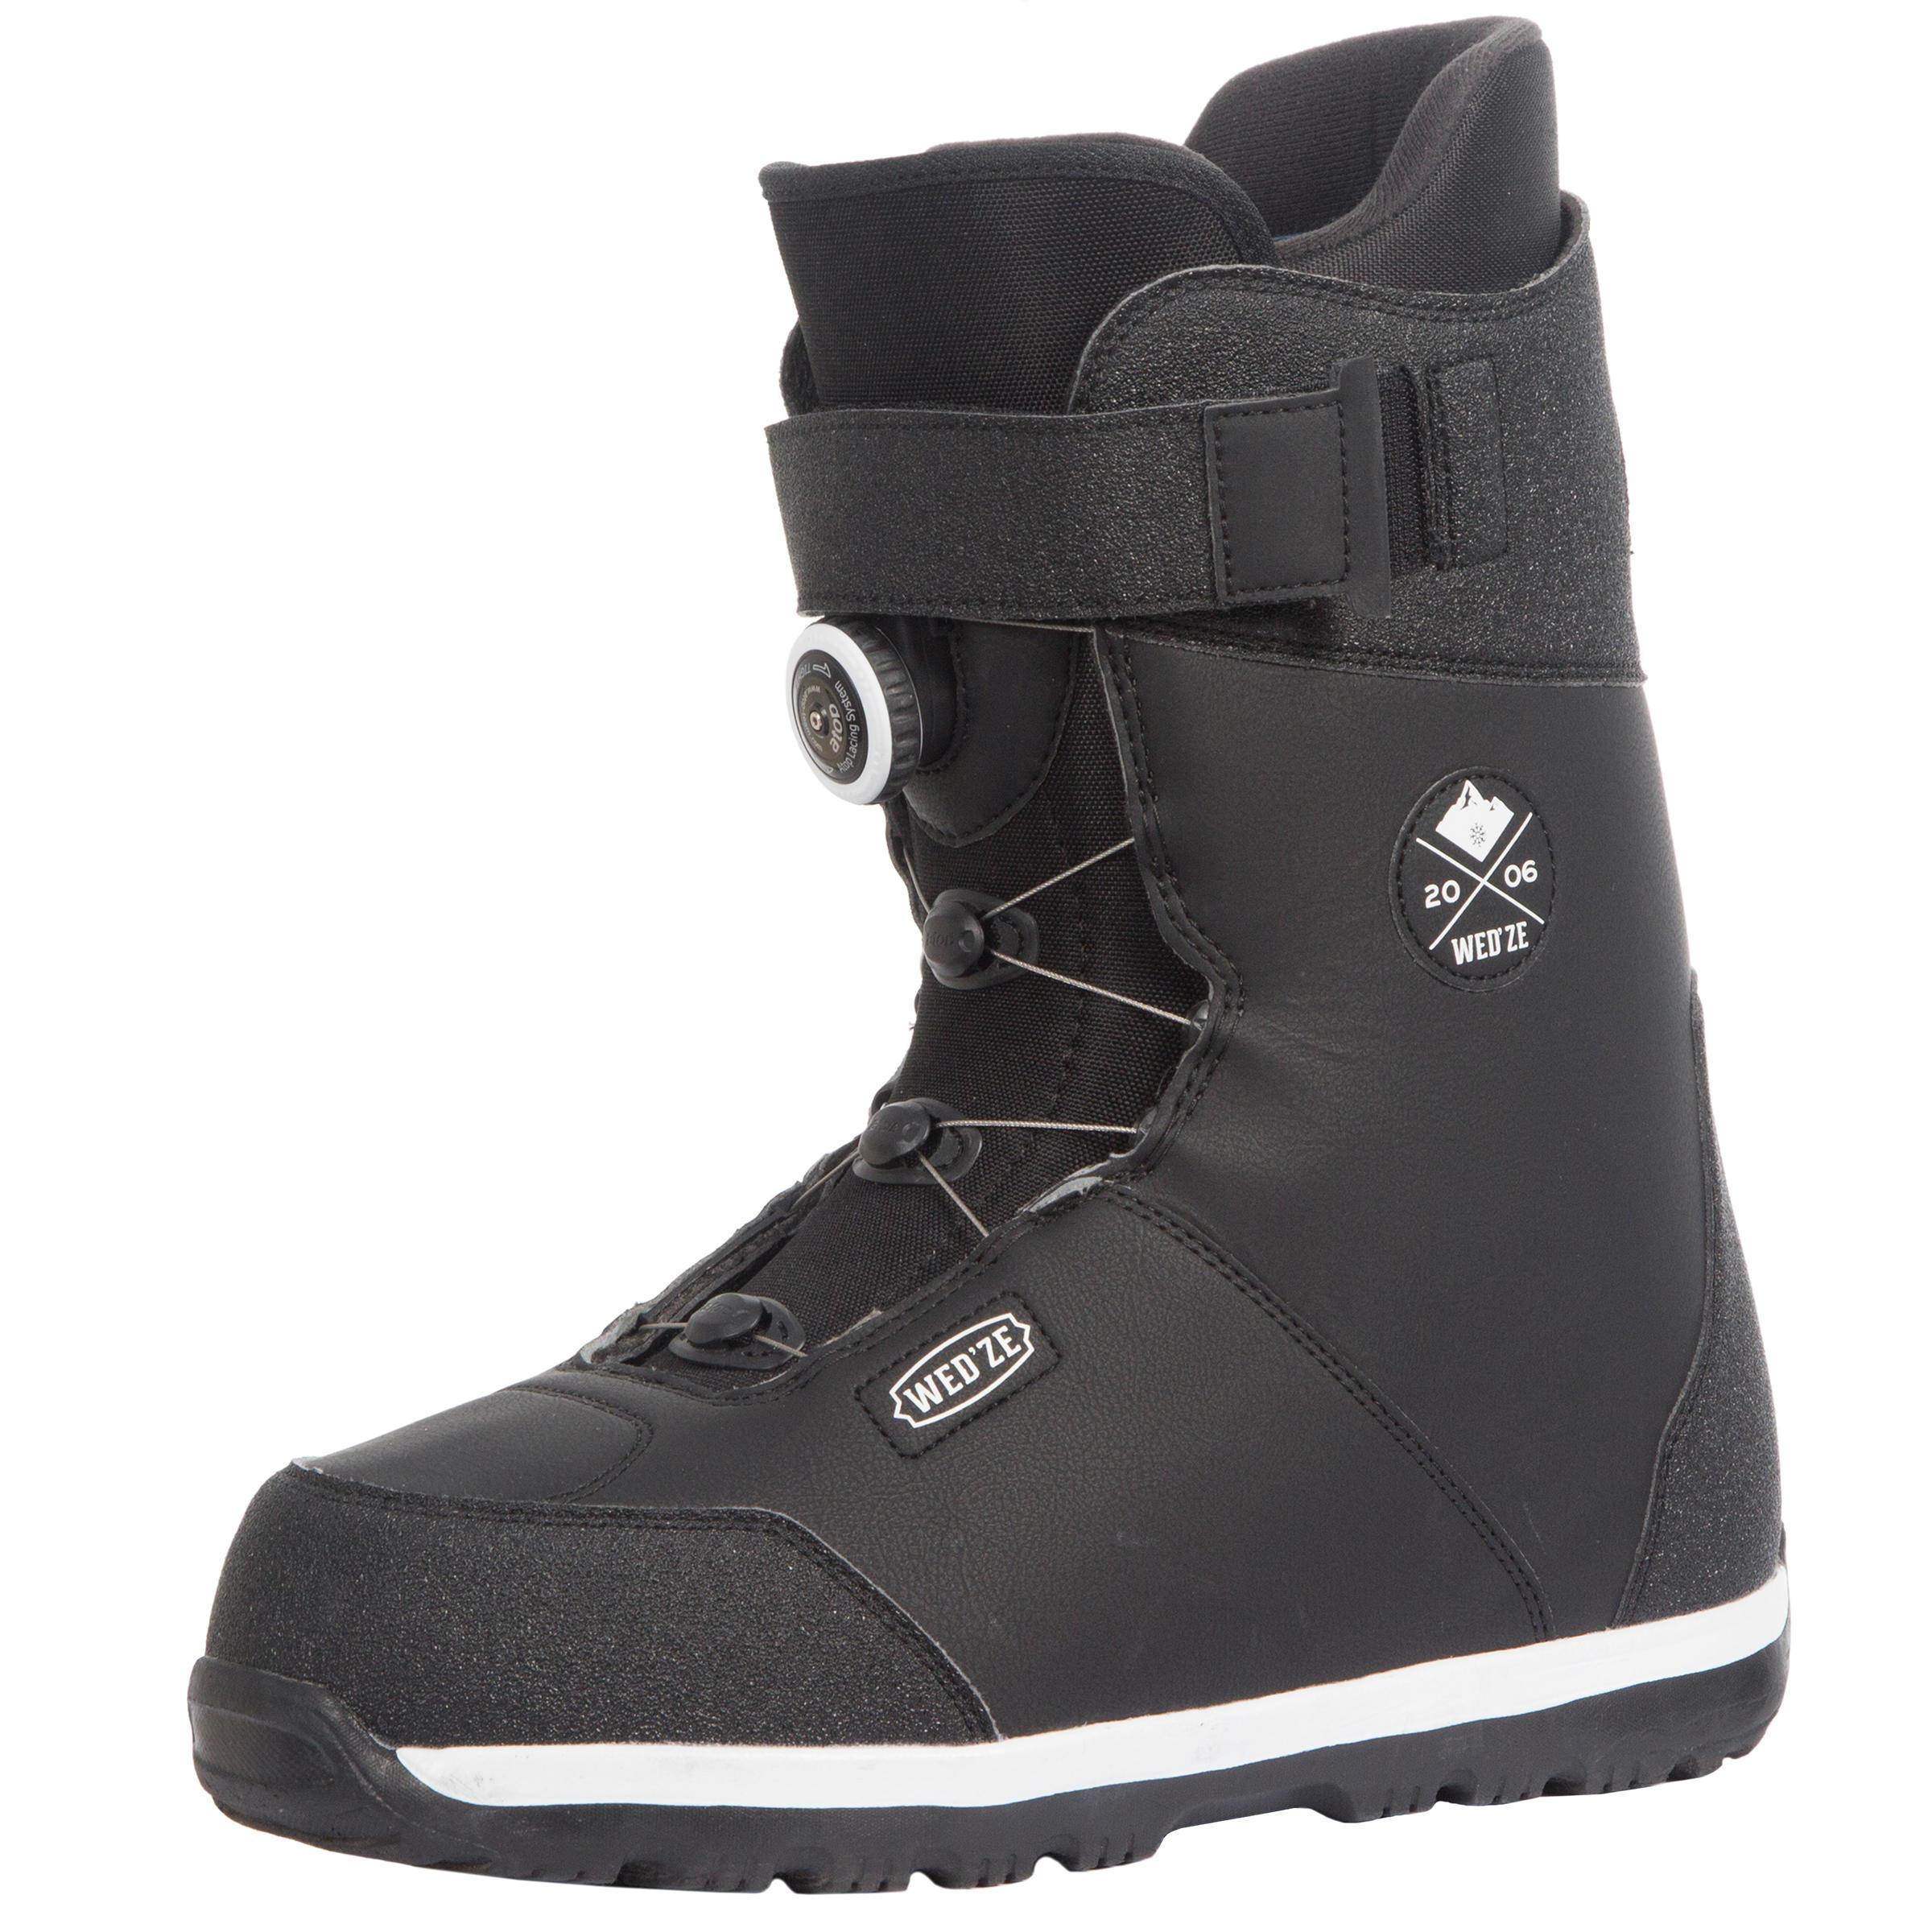 Chaussures de snowboard homme piste hors piste foraker 500 noires wedze